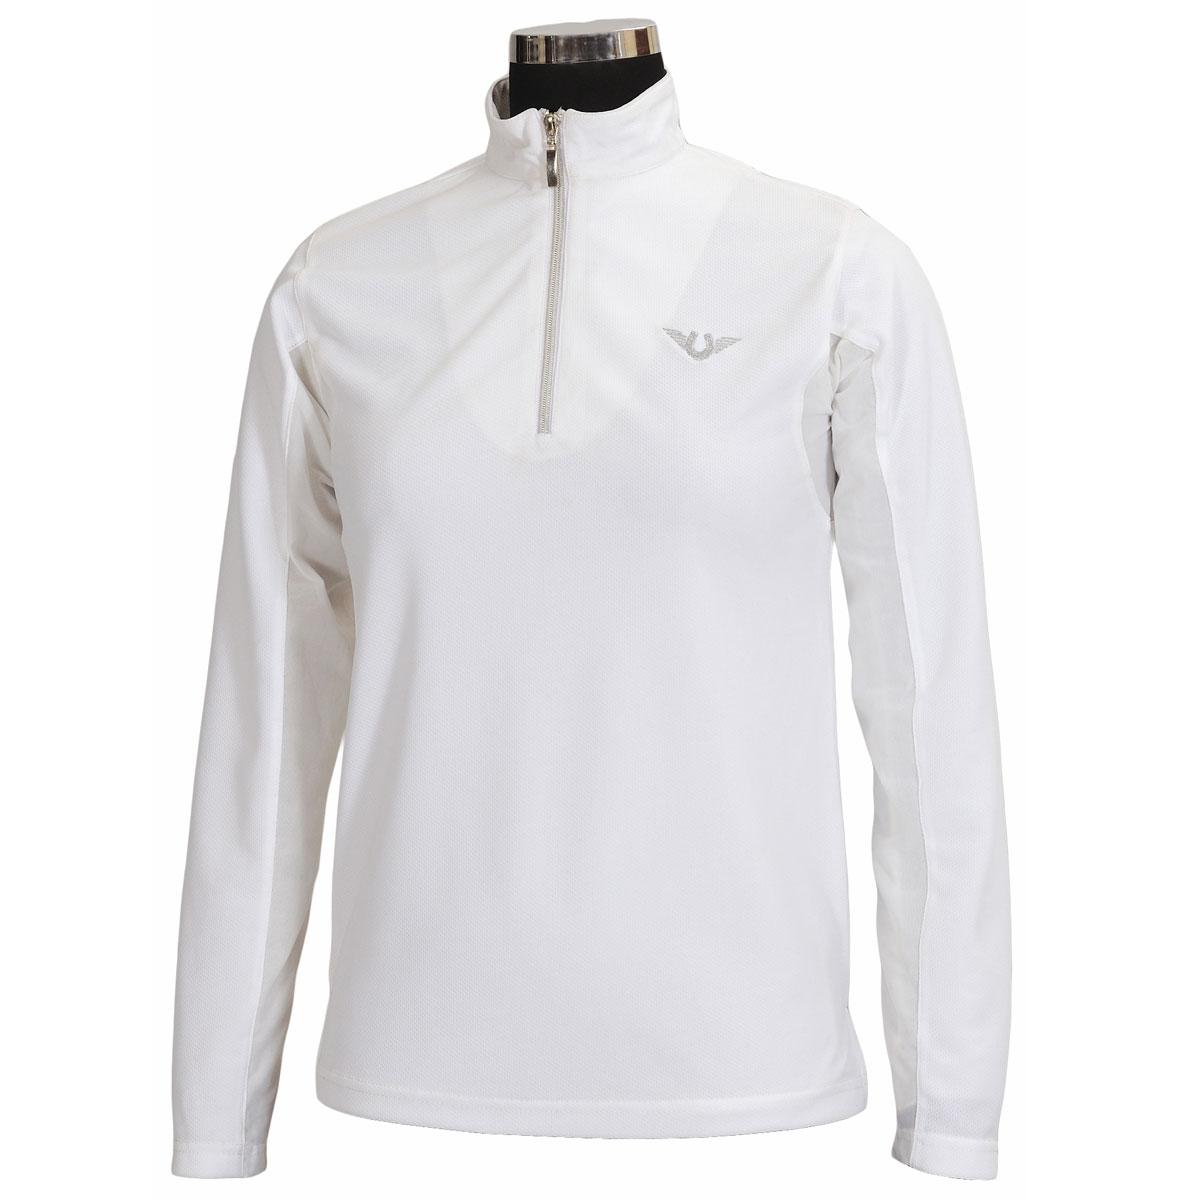 TuffRider Kids Ventilated Long Sleeve Shirt